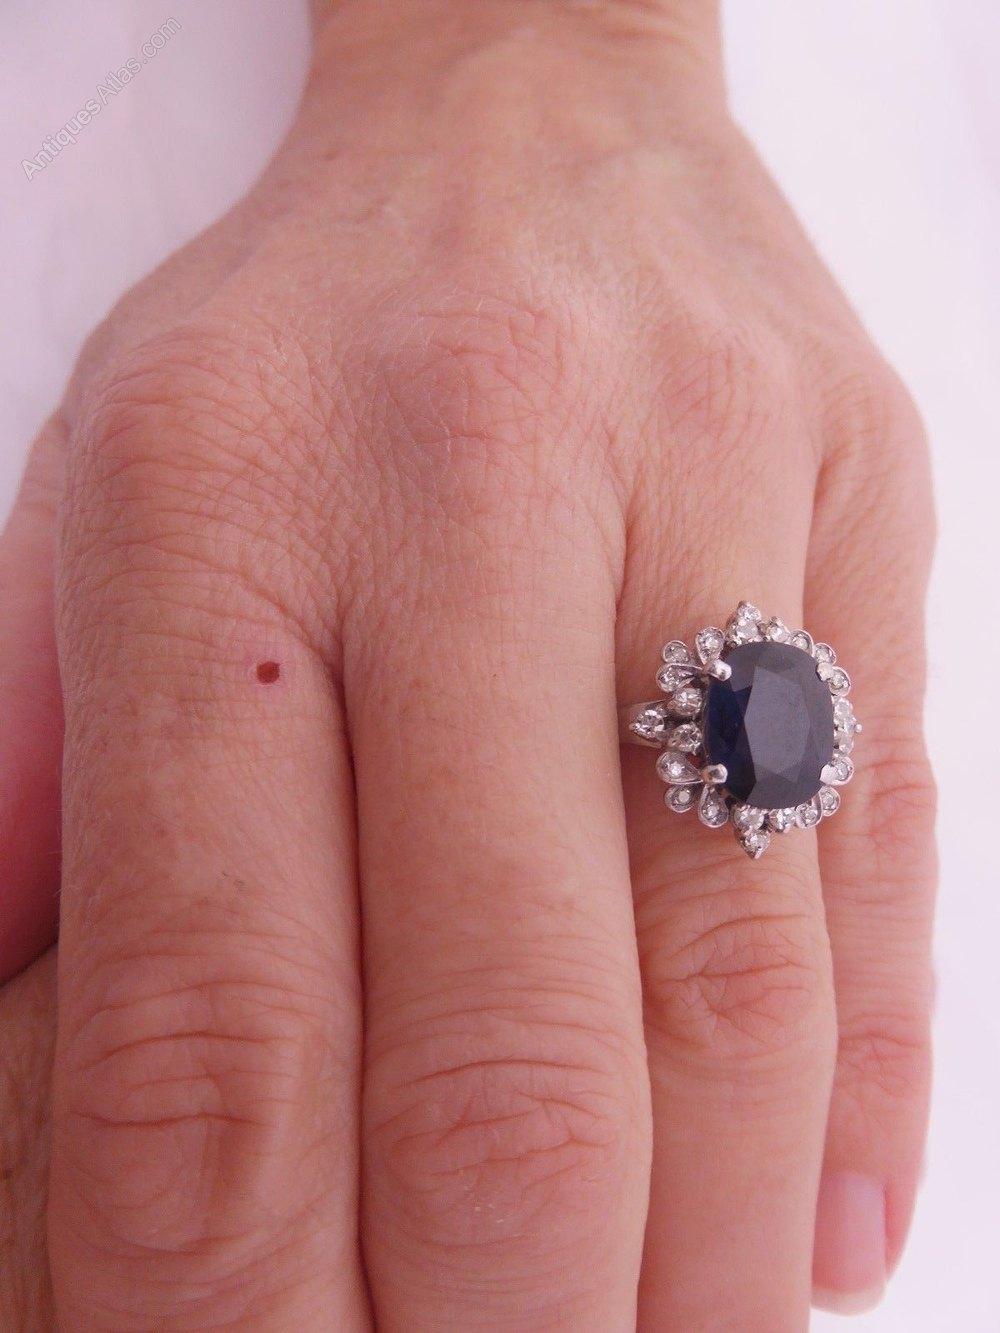 Antiques Atlas - 18ct White Gold 2.5ct Sapphire & Diamond Ring